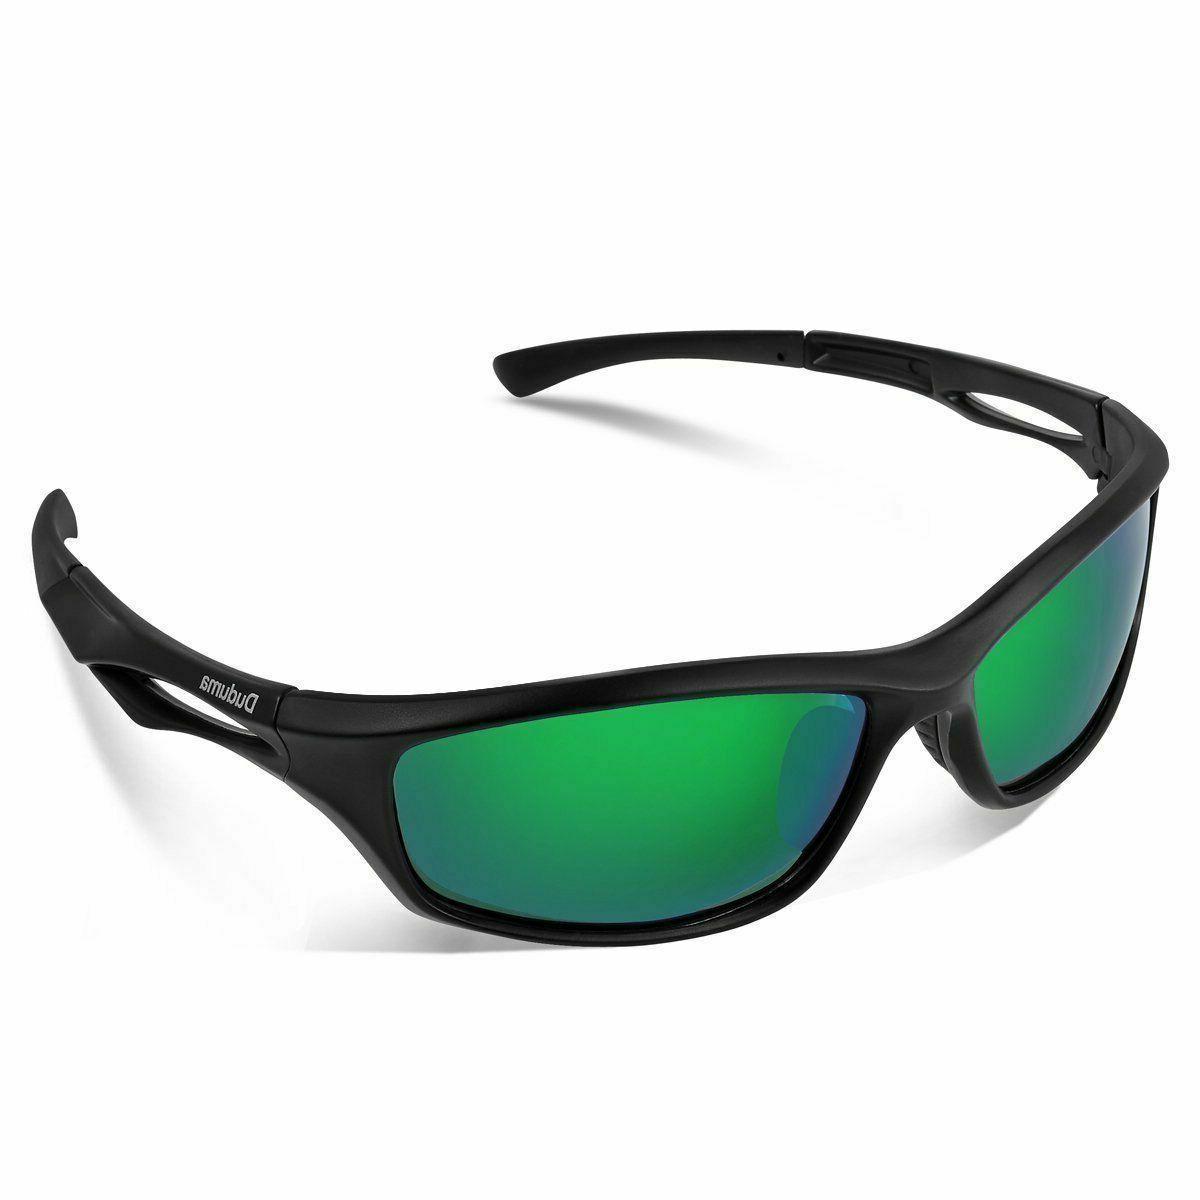 Duduma Polarized Sunglasses for Baseball full